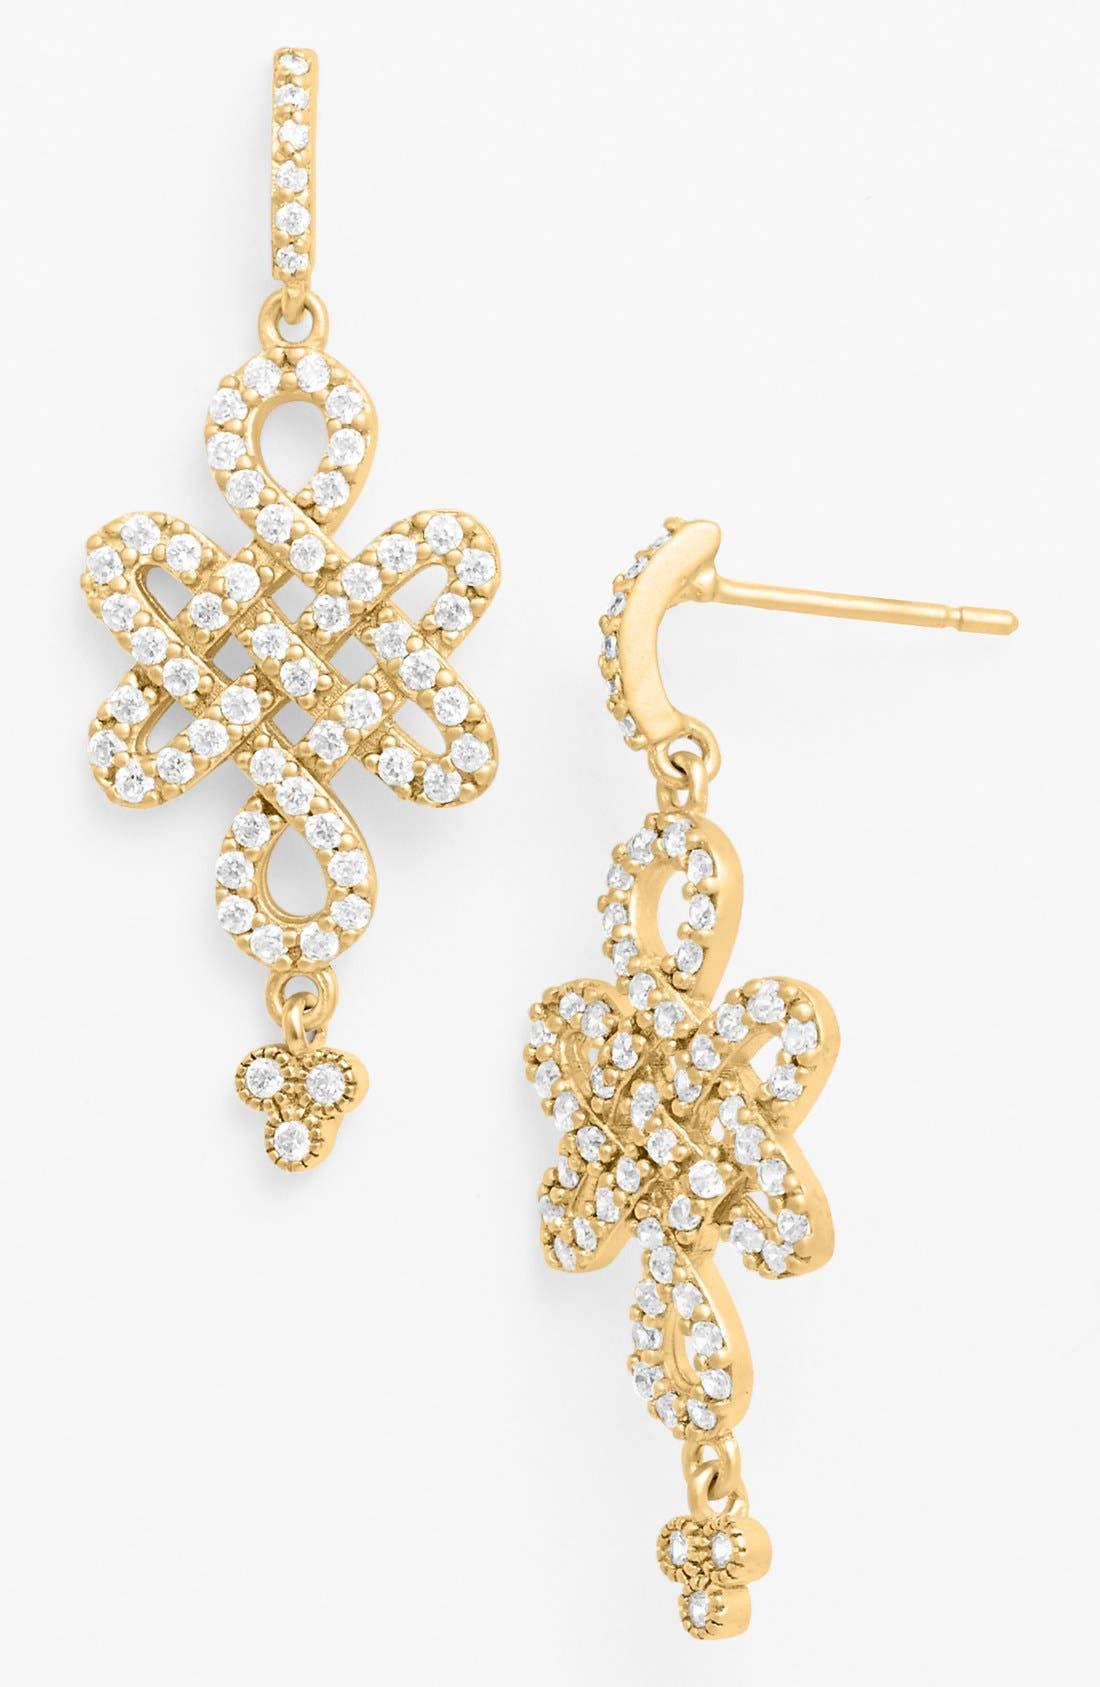 Main Image - FREIDA ROTHMAN Love Knot Drop Earrings